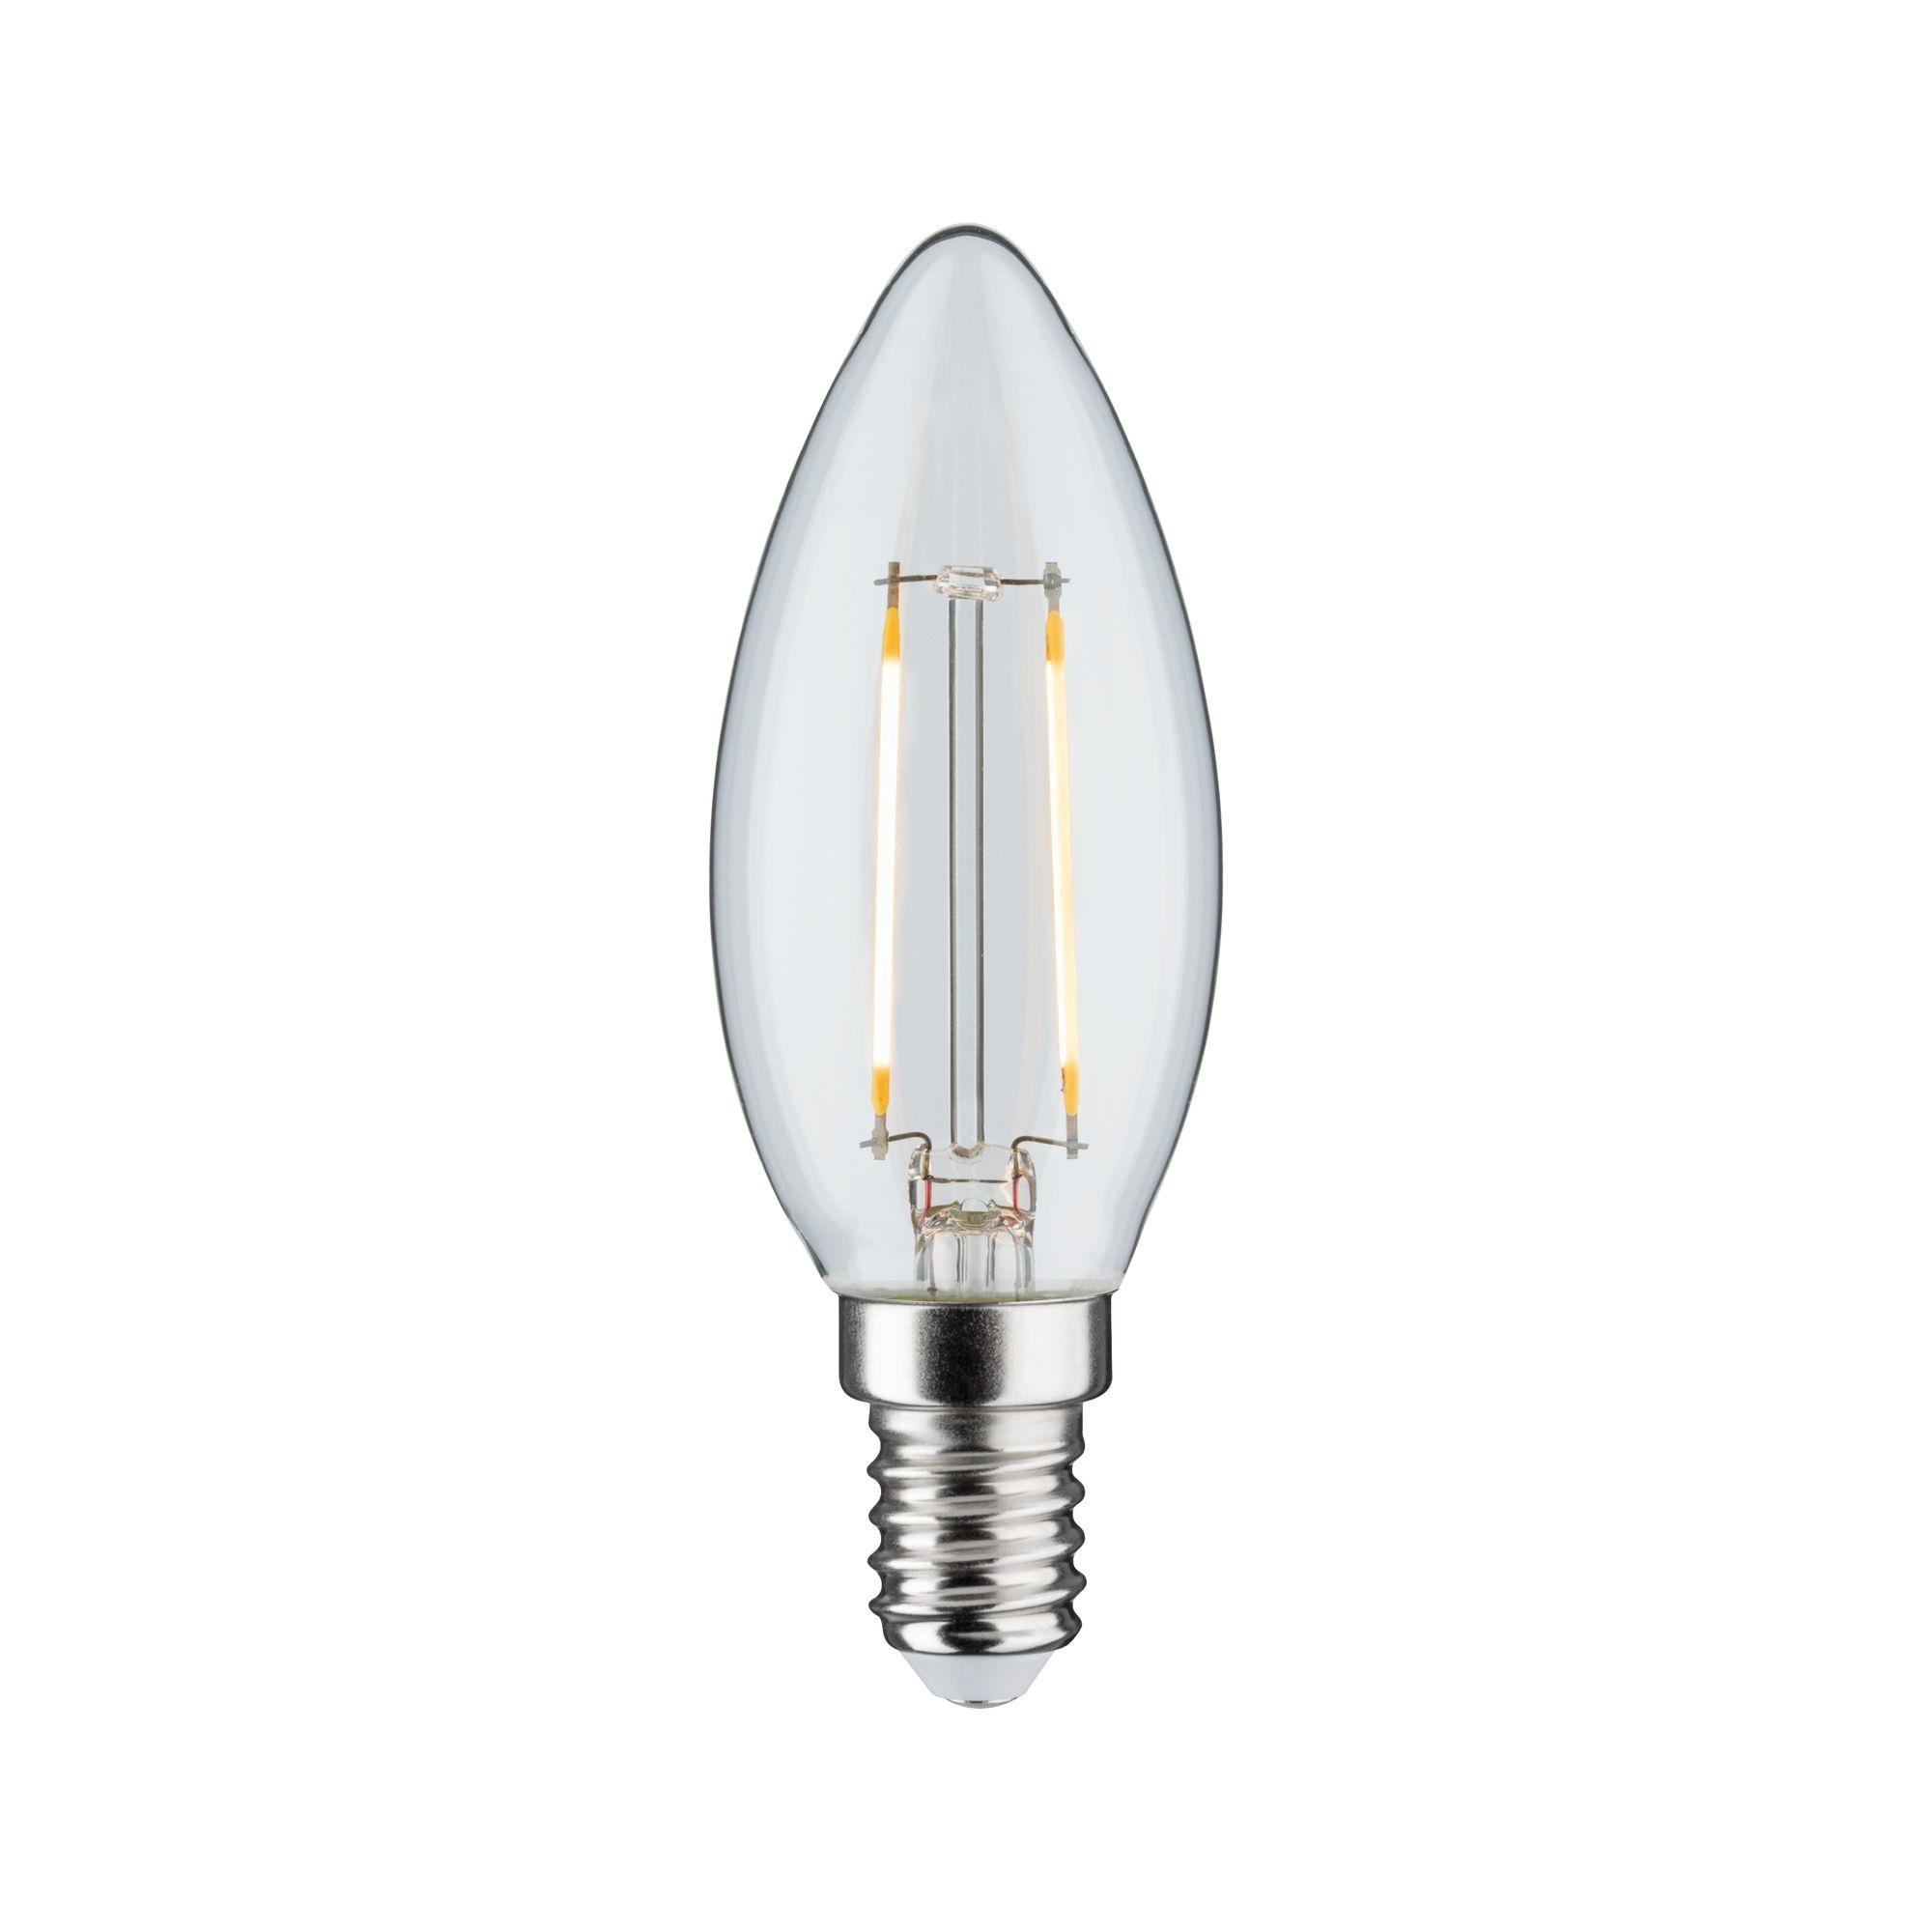 Paulmann LED Kerze 2,5W E14 Klar 230 V 3-Stufen-dimmbar